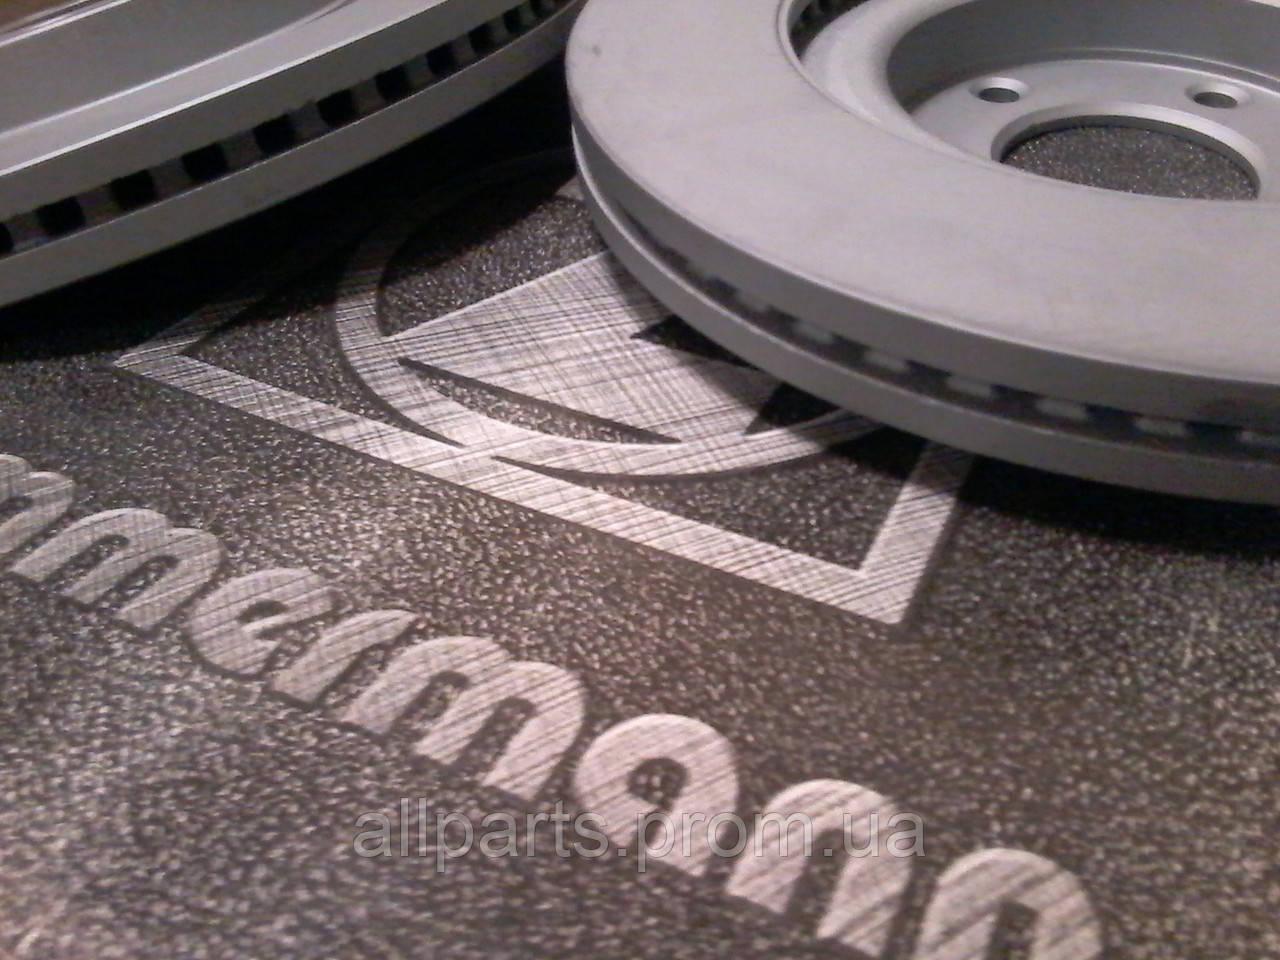 Тормозные диски Honda CR-V (RE, 2006- ) передние Zimmermann